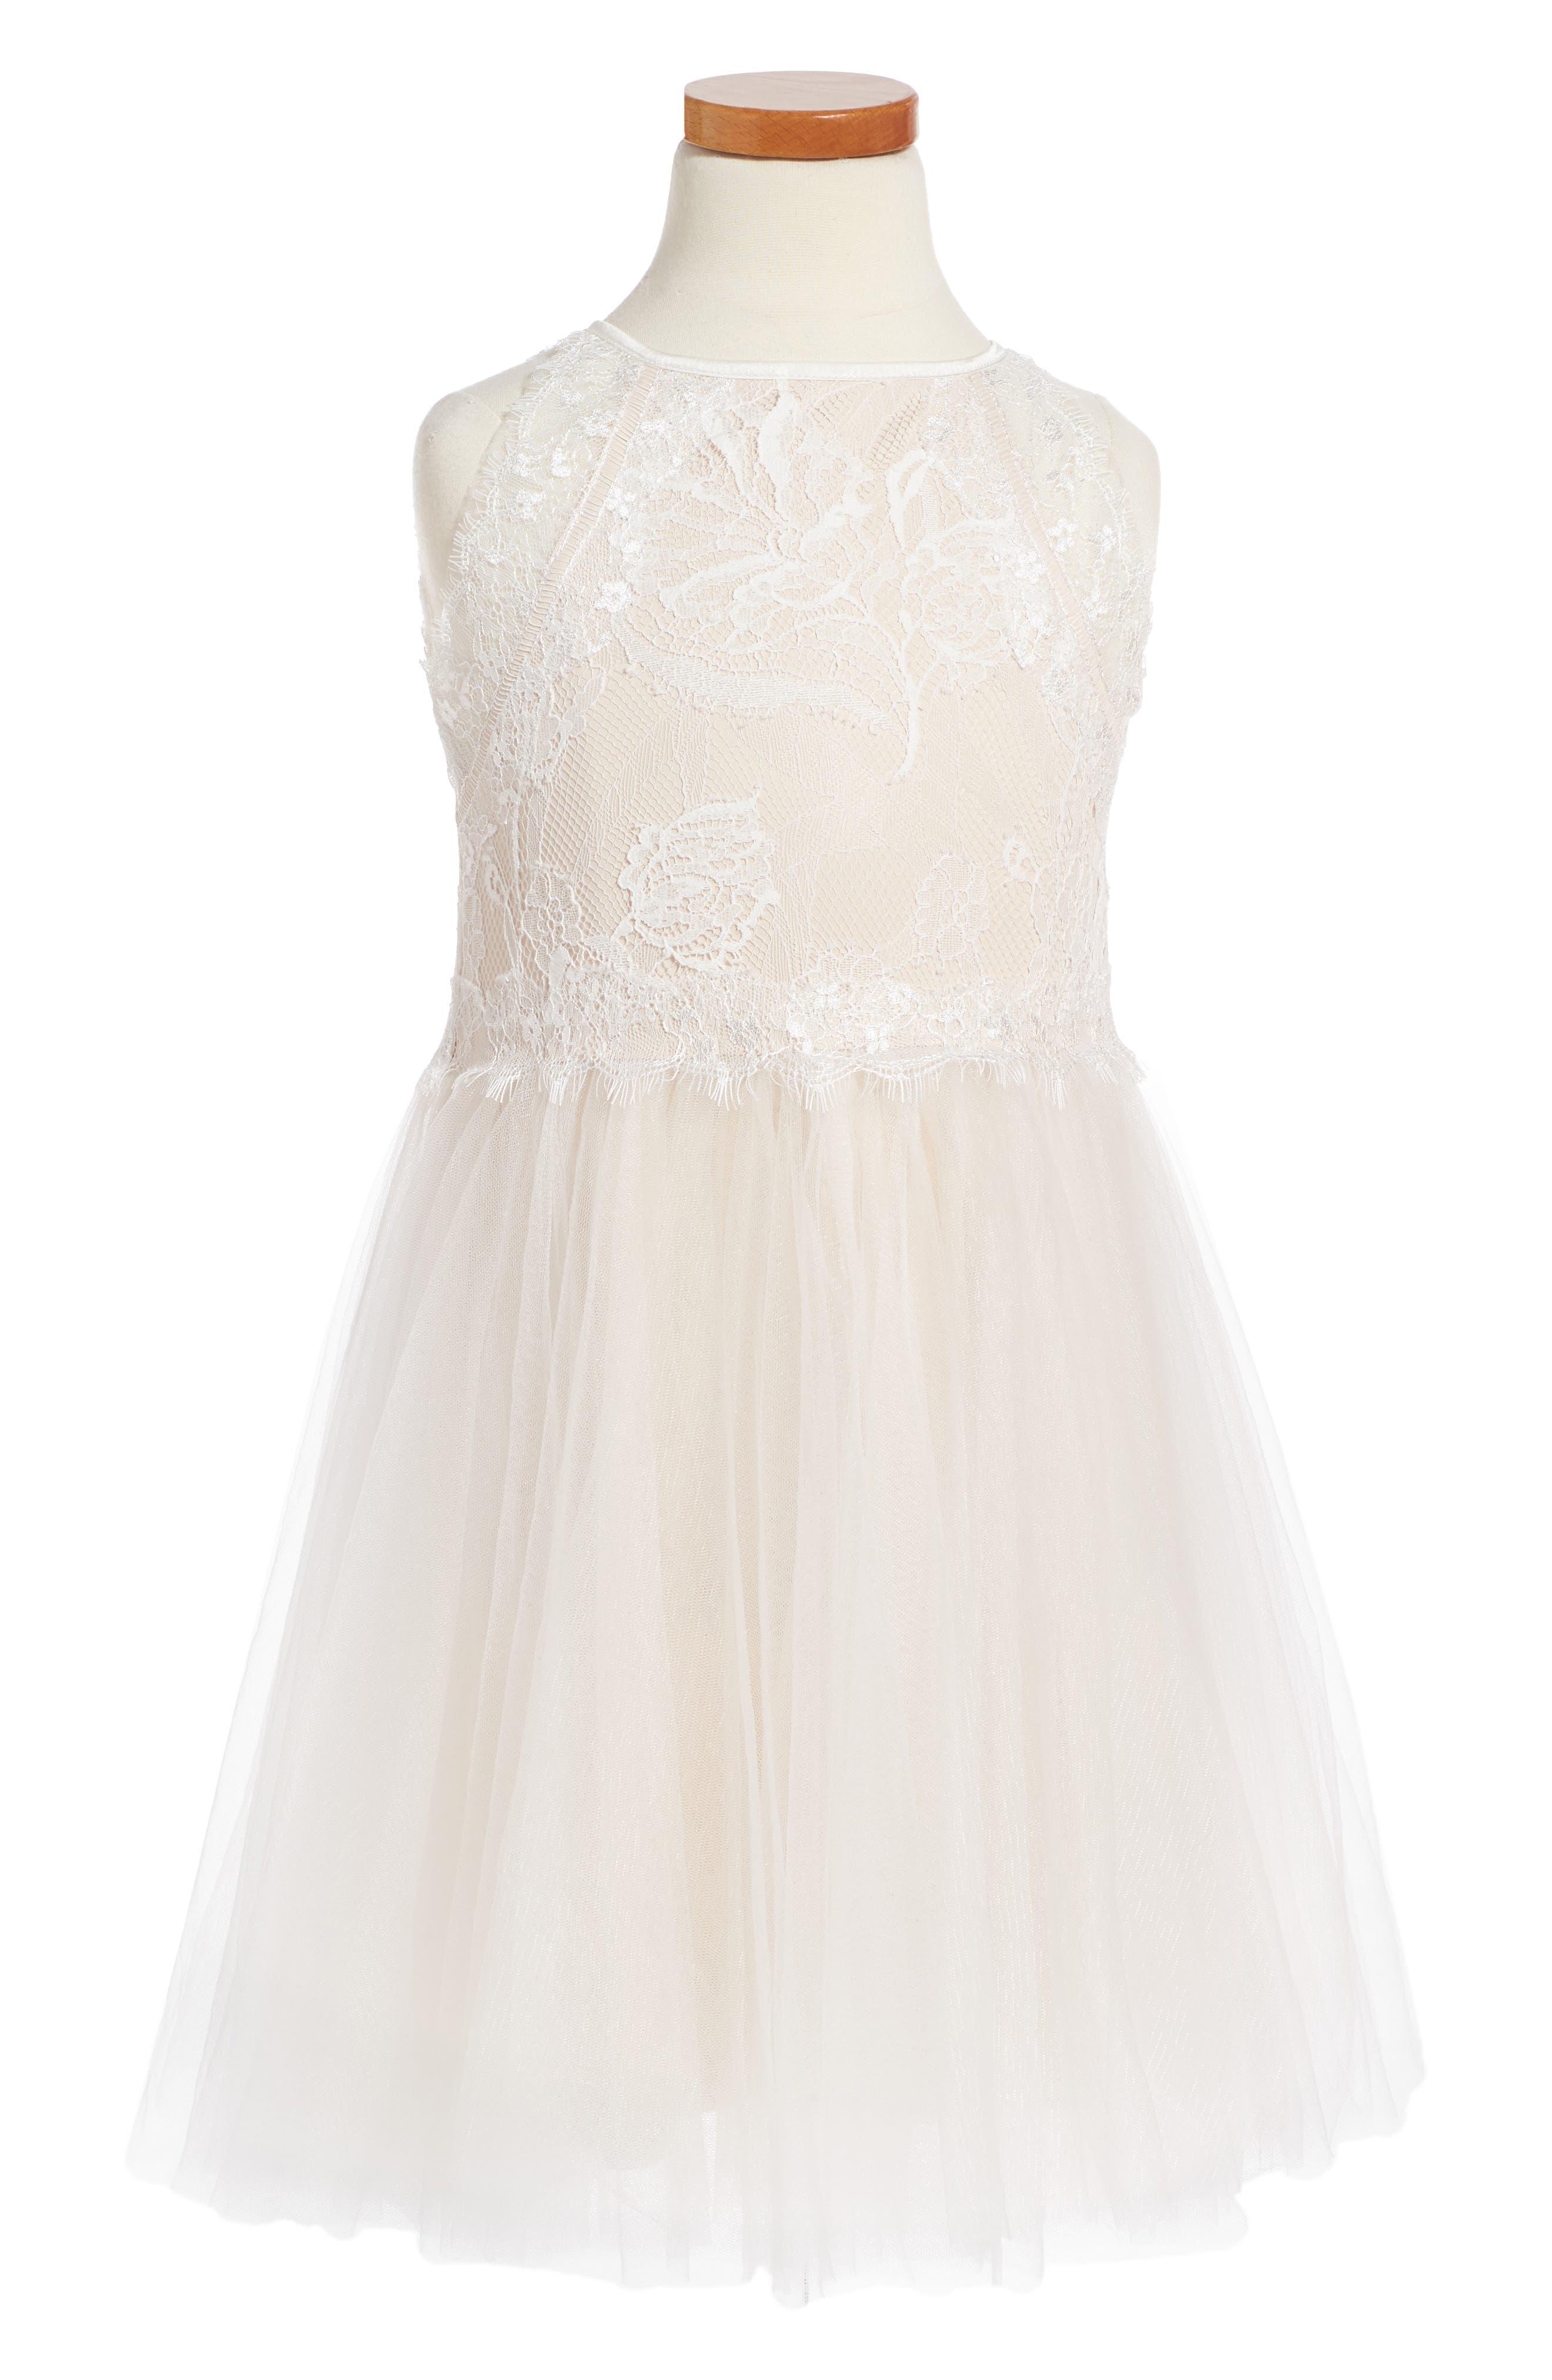 Tadashi Shoji Sleeveless Lace Dress (Toddler Girls, Little Girls & Big Girls)